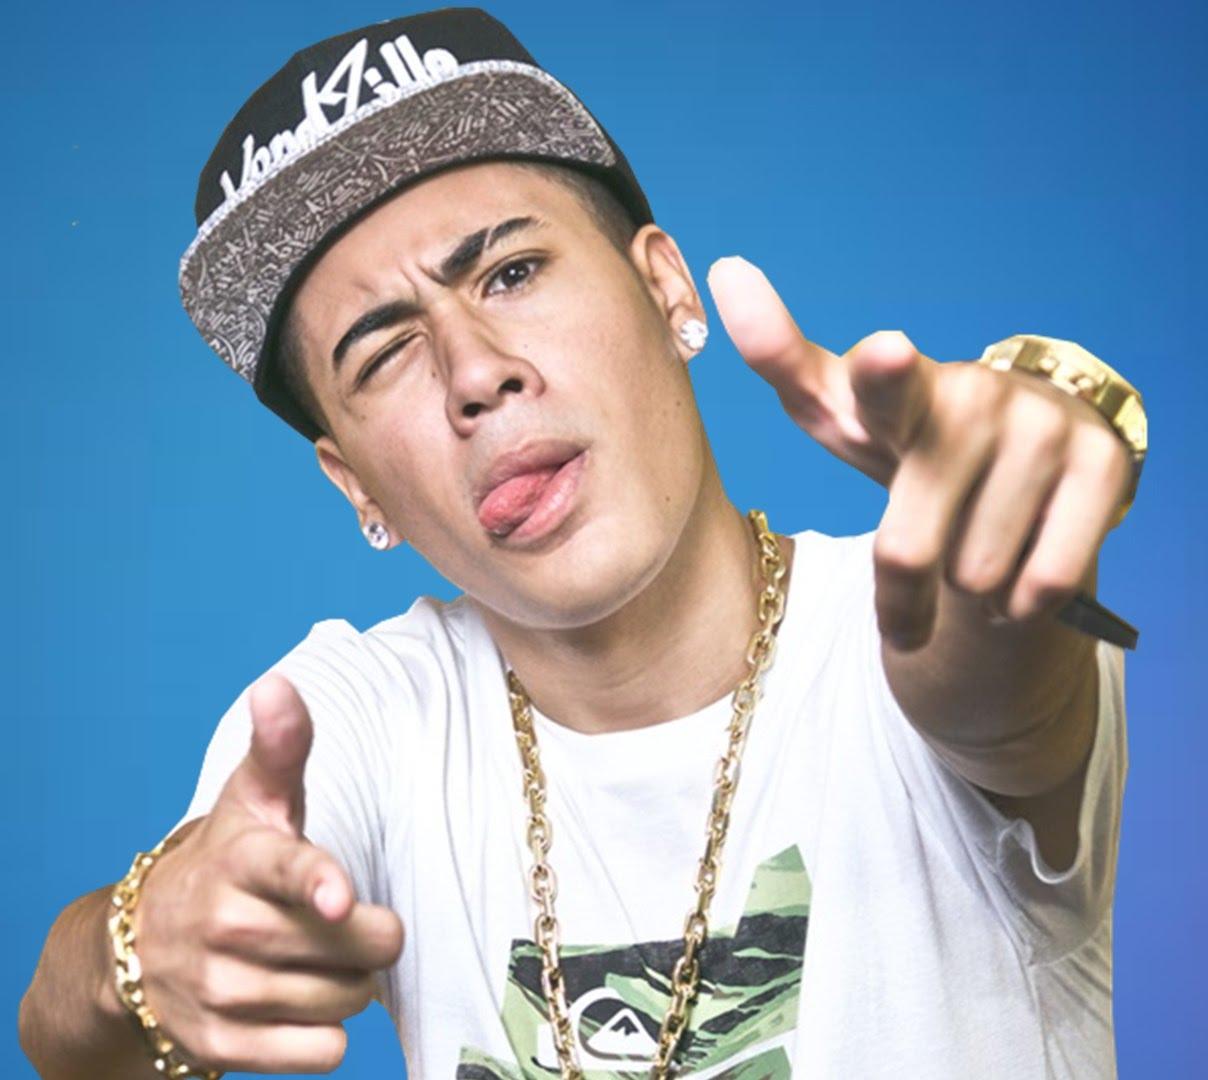 MC Kevinho Lyrics, Music, News and Biography | MetroLyrics